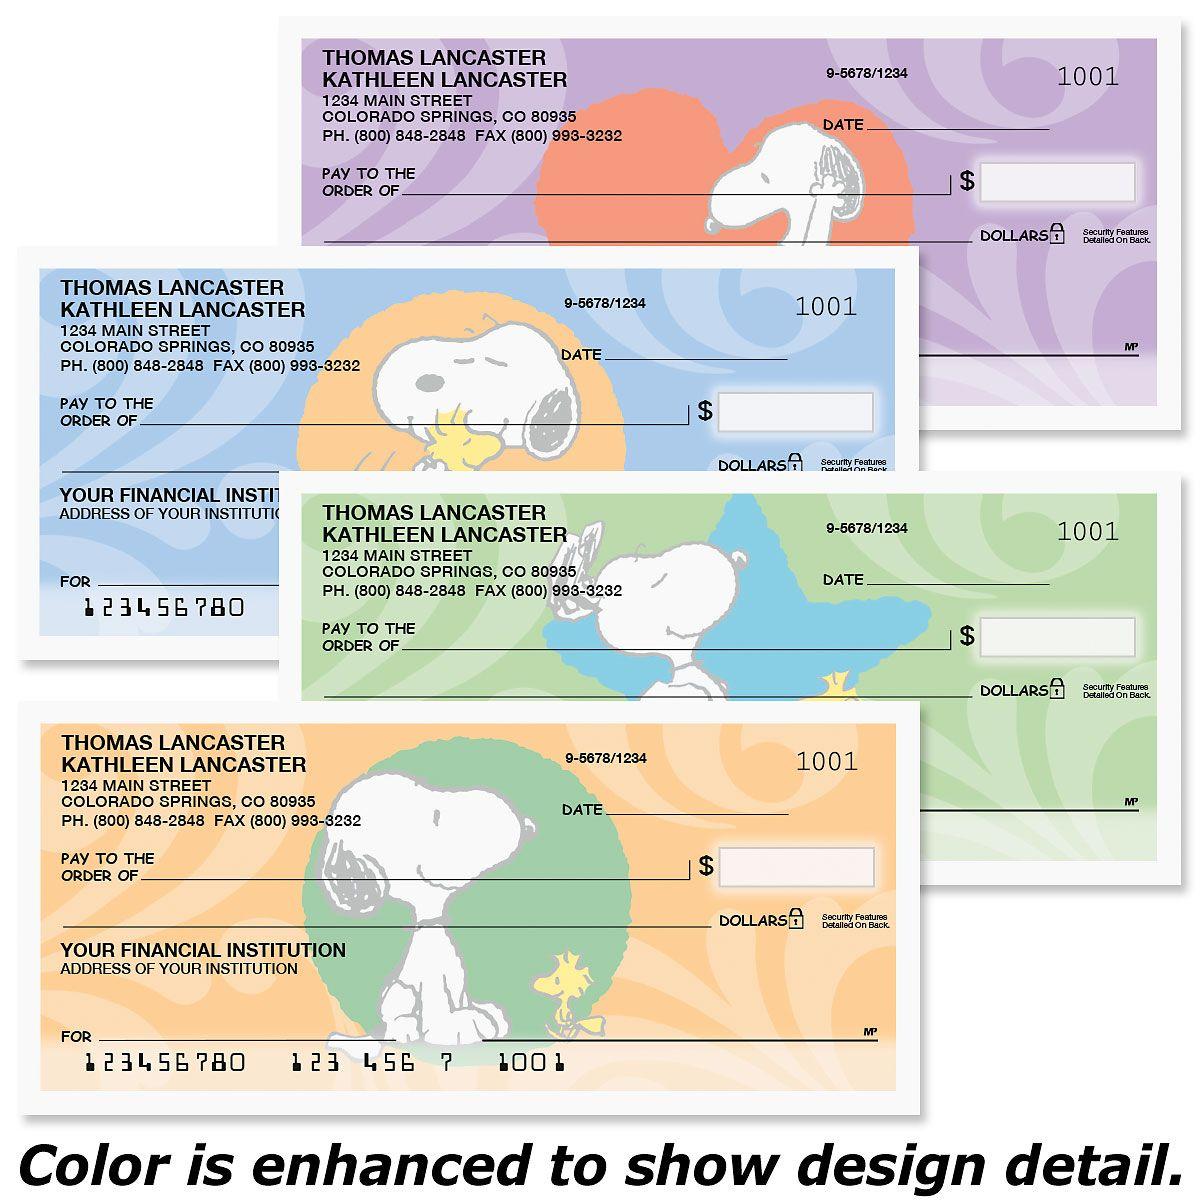 Snoopy™ & Woodstock Personal Premium Checks